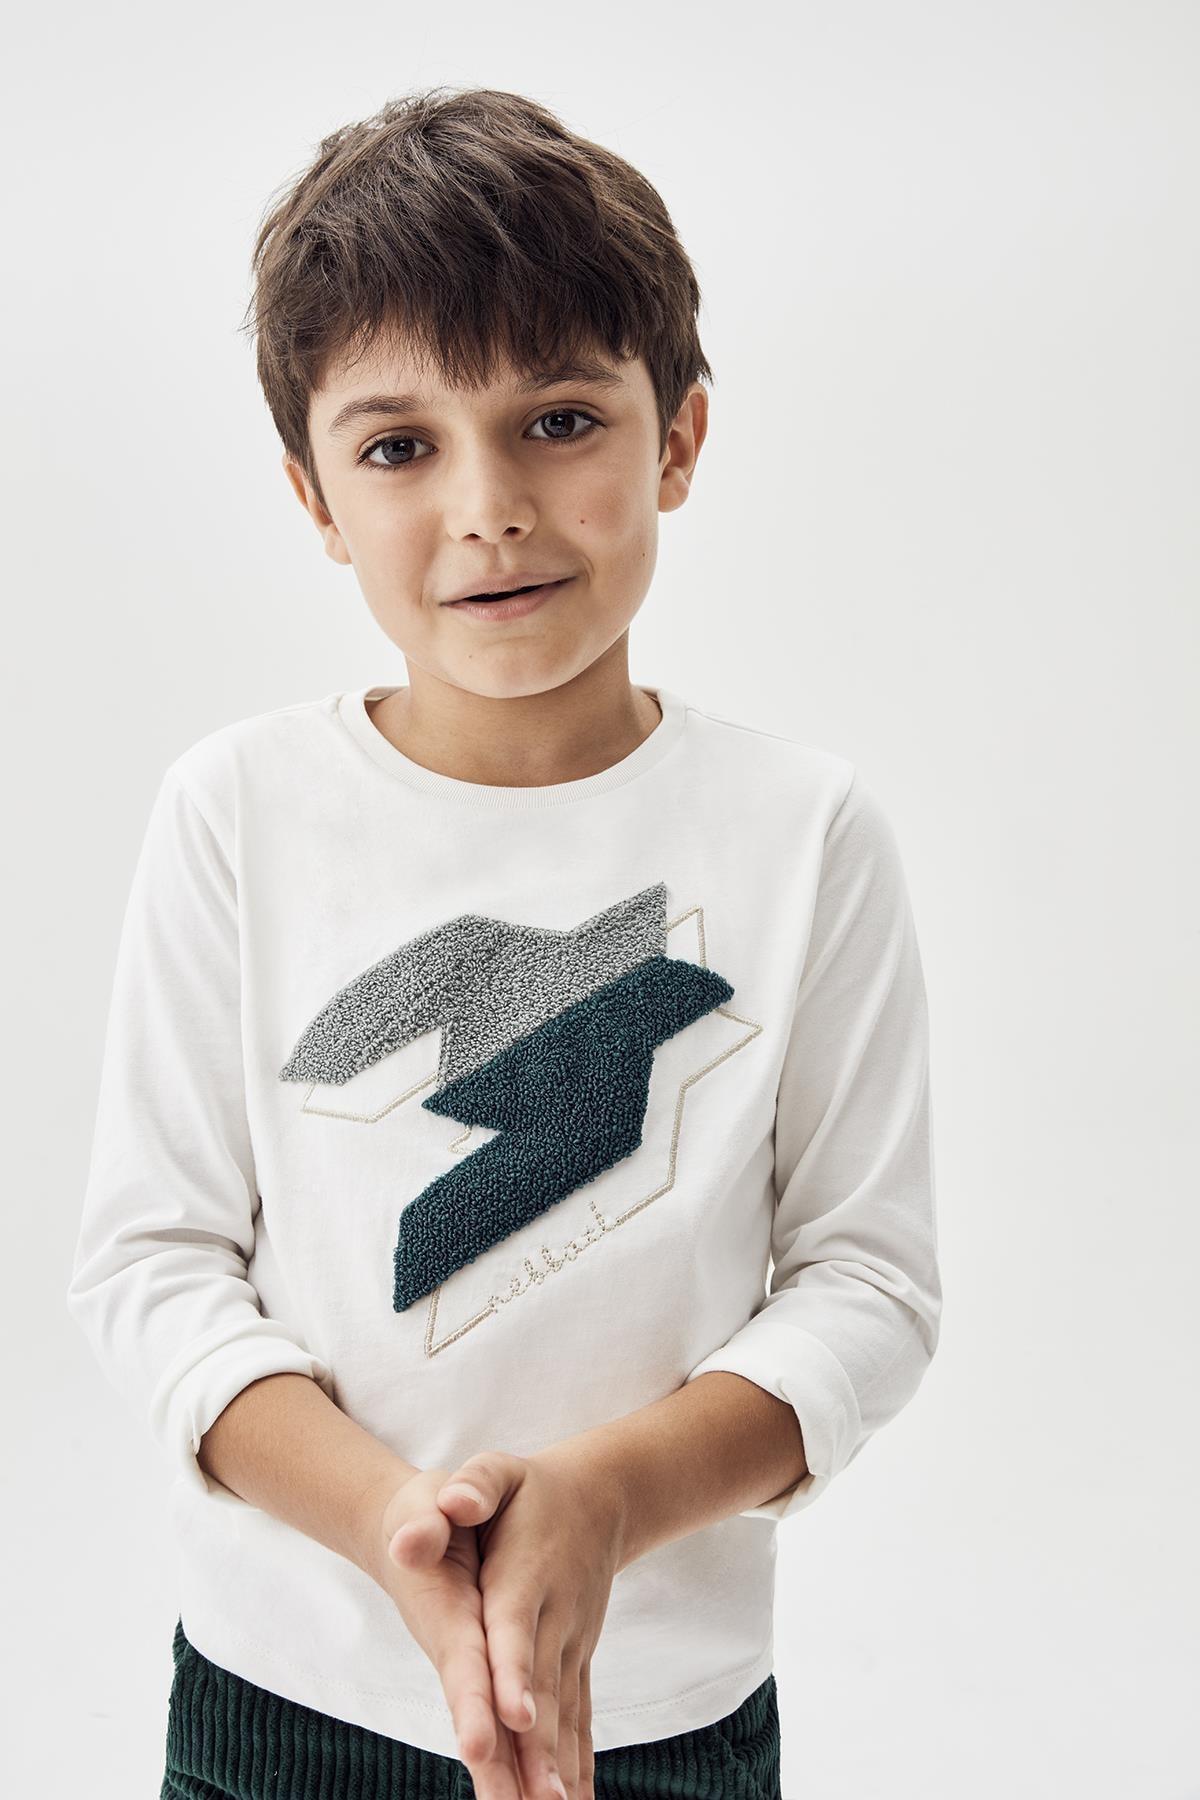 Nebbati Erkek Çocuk Beyaz T-shirt 20fw0nb3520 1